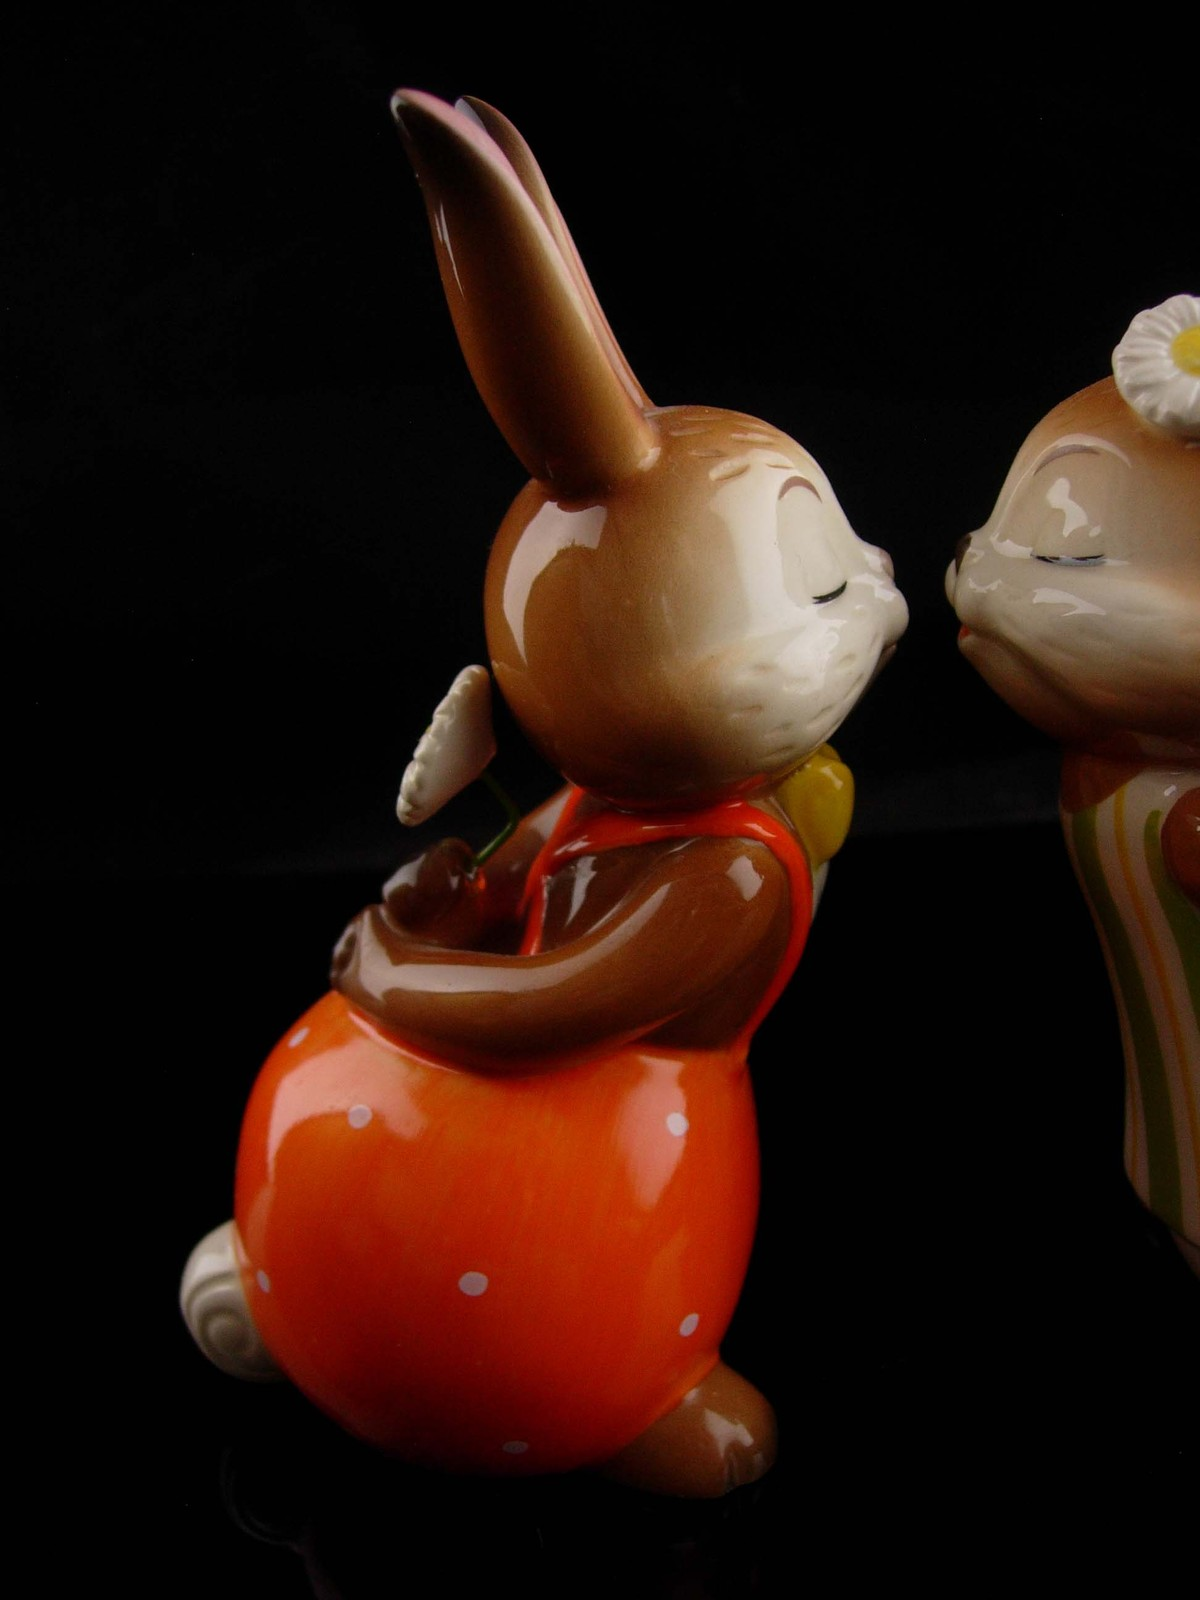 Vintage kissing bunny goebel - new mom gift - mothers day gift - german figurine image 6